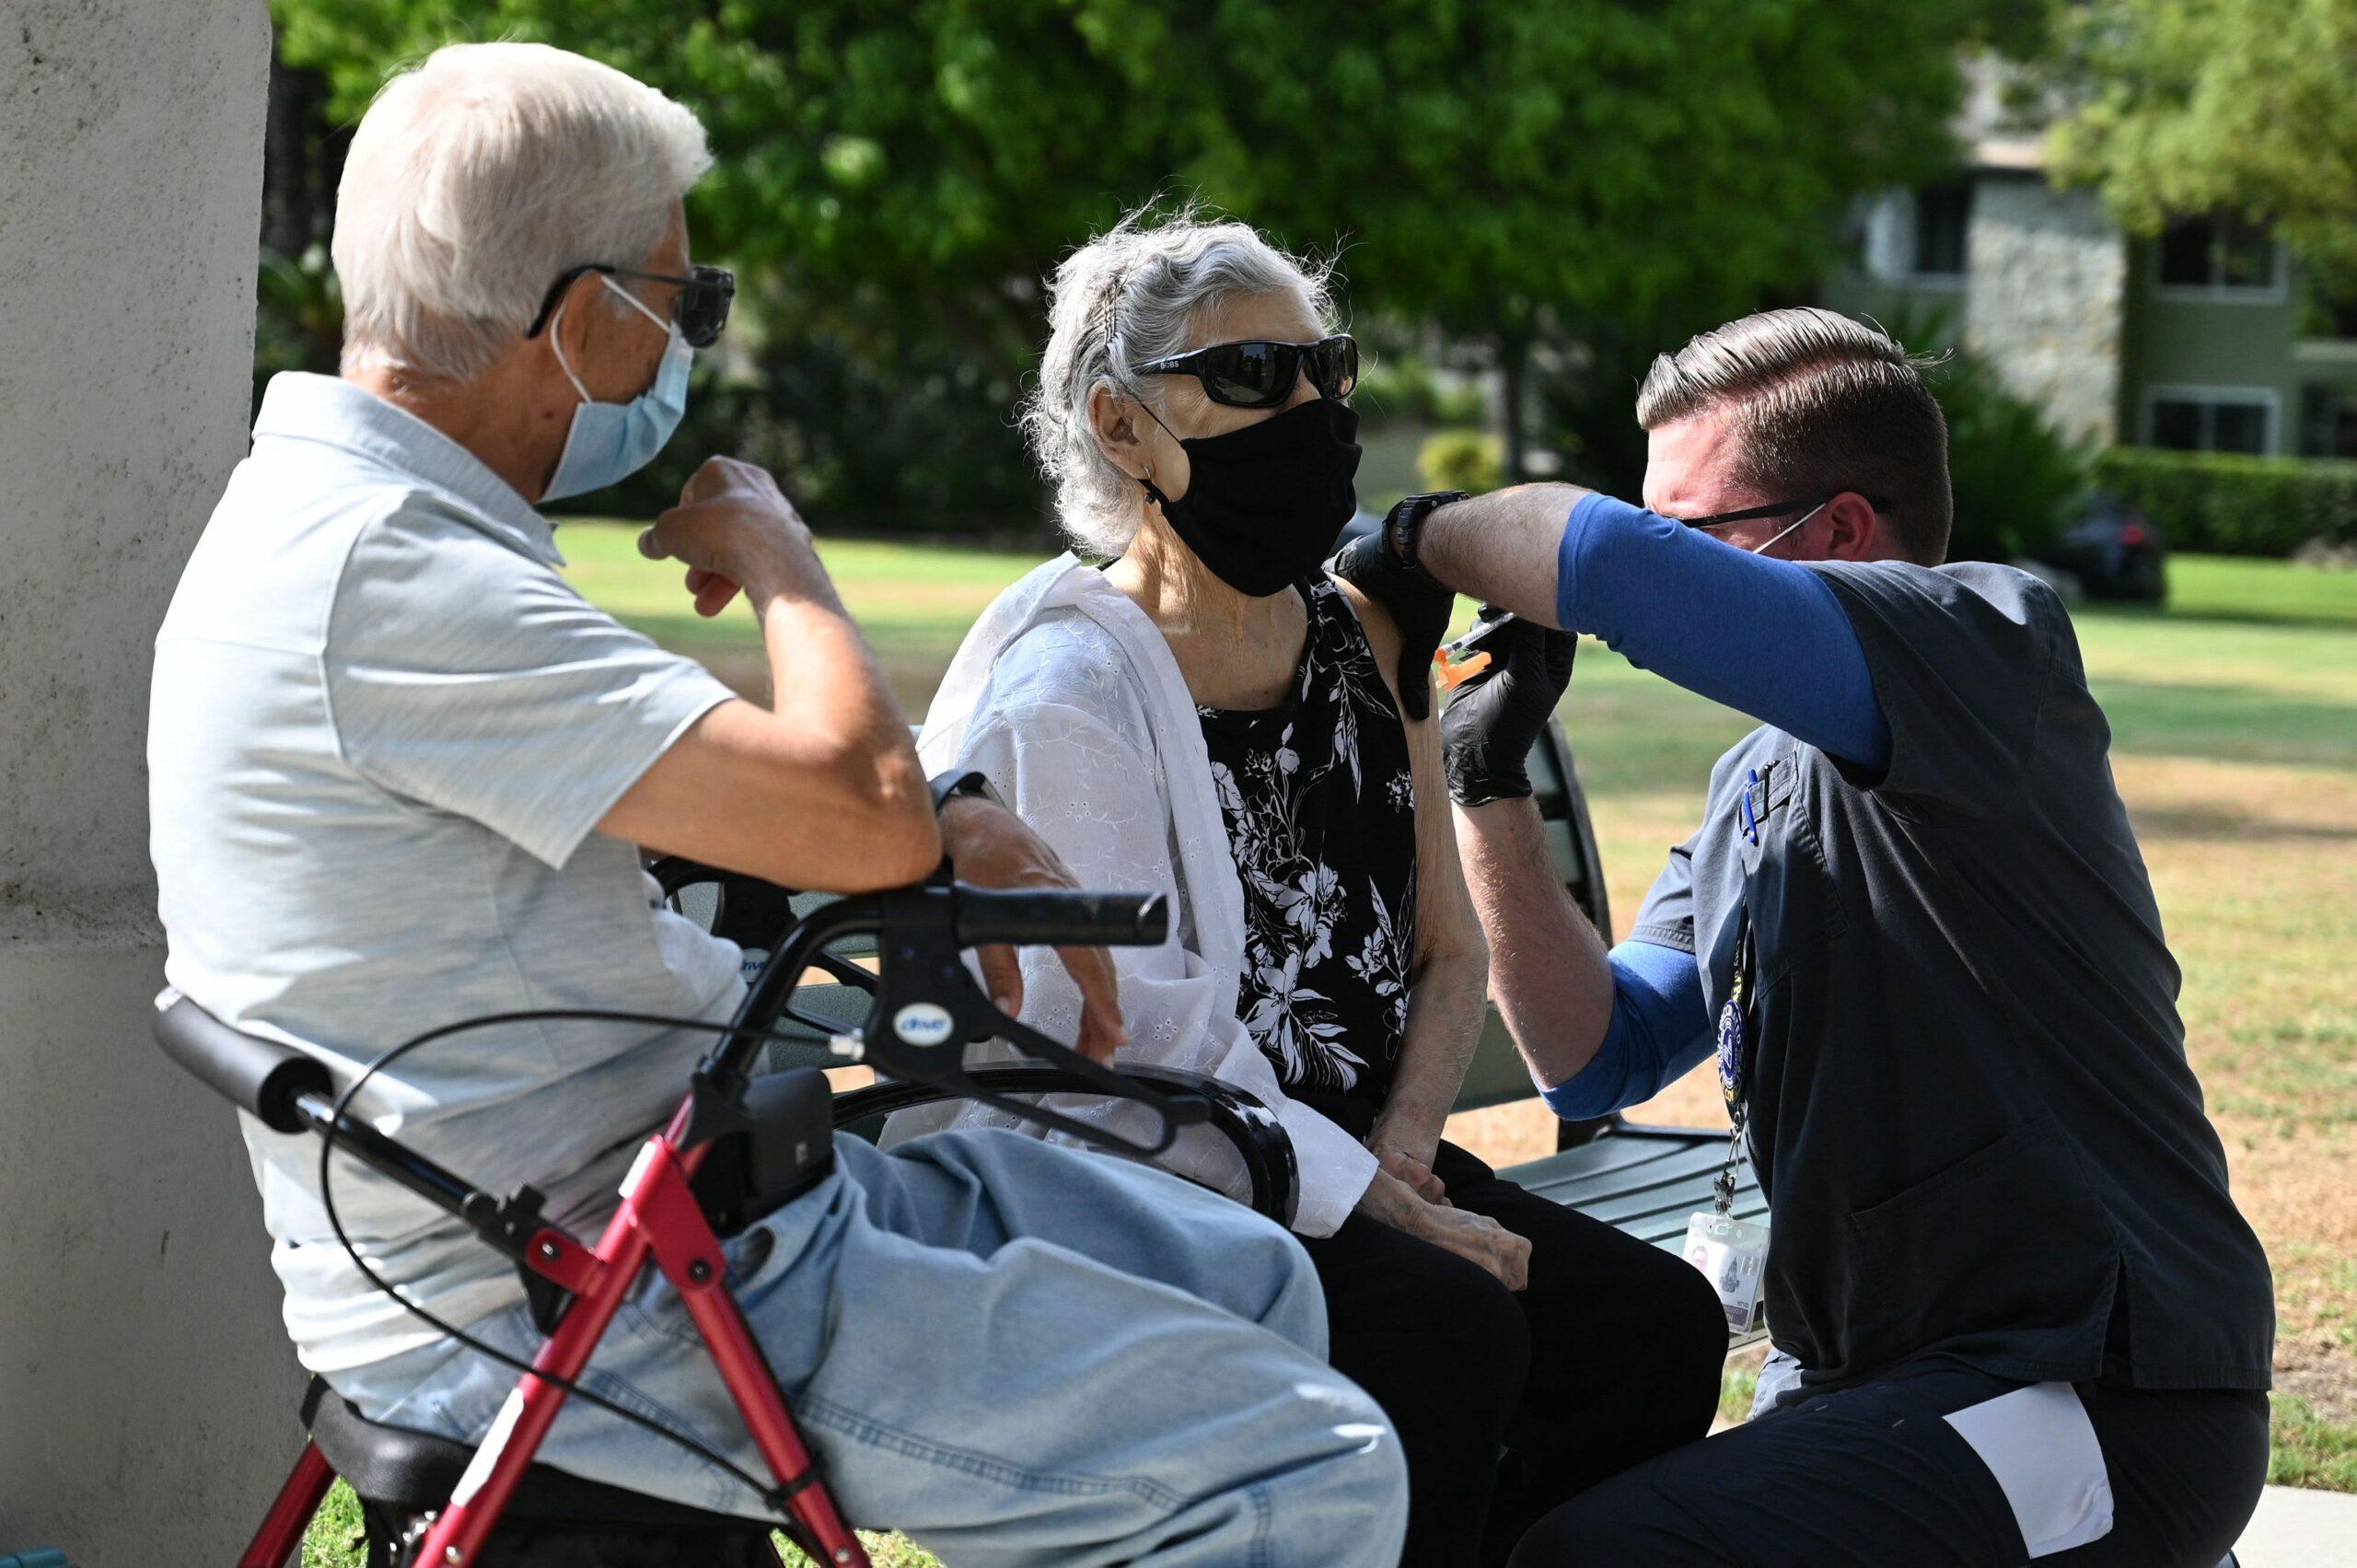 FDA meeting puts Biden's plan to combat virus at risk